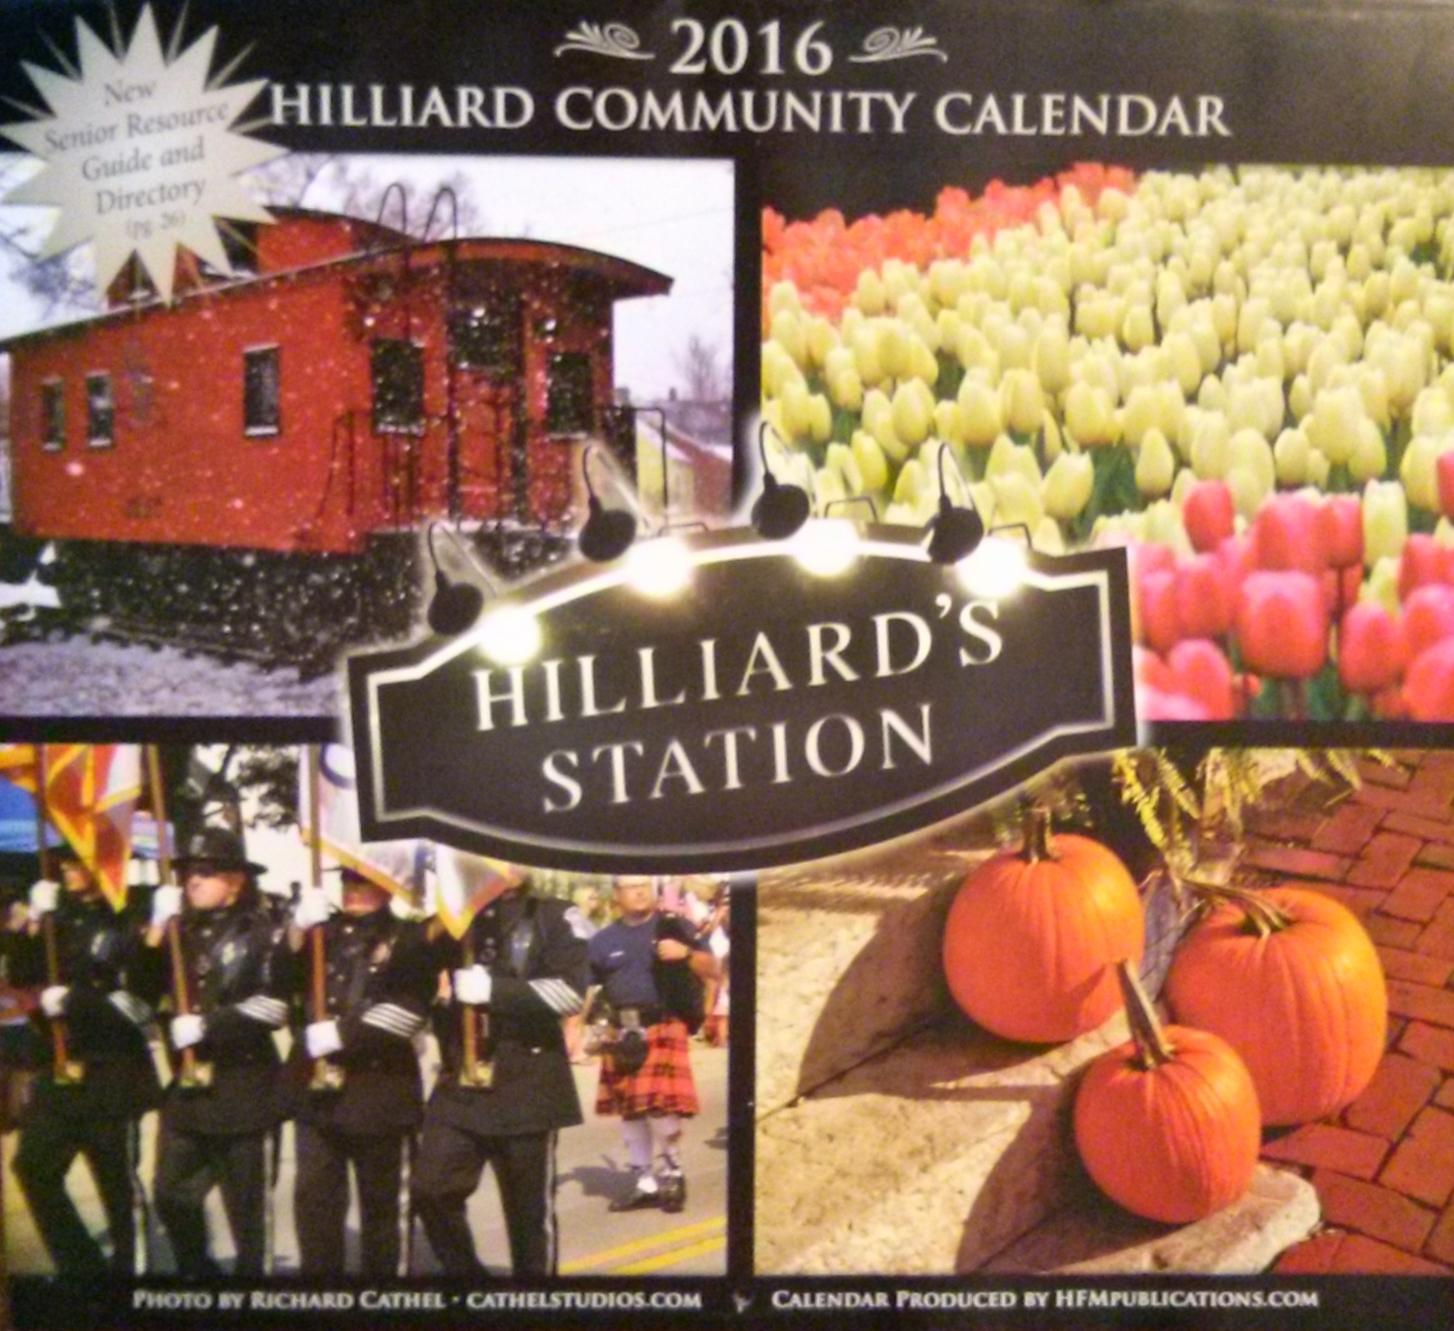 Hilliard Community Calendar